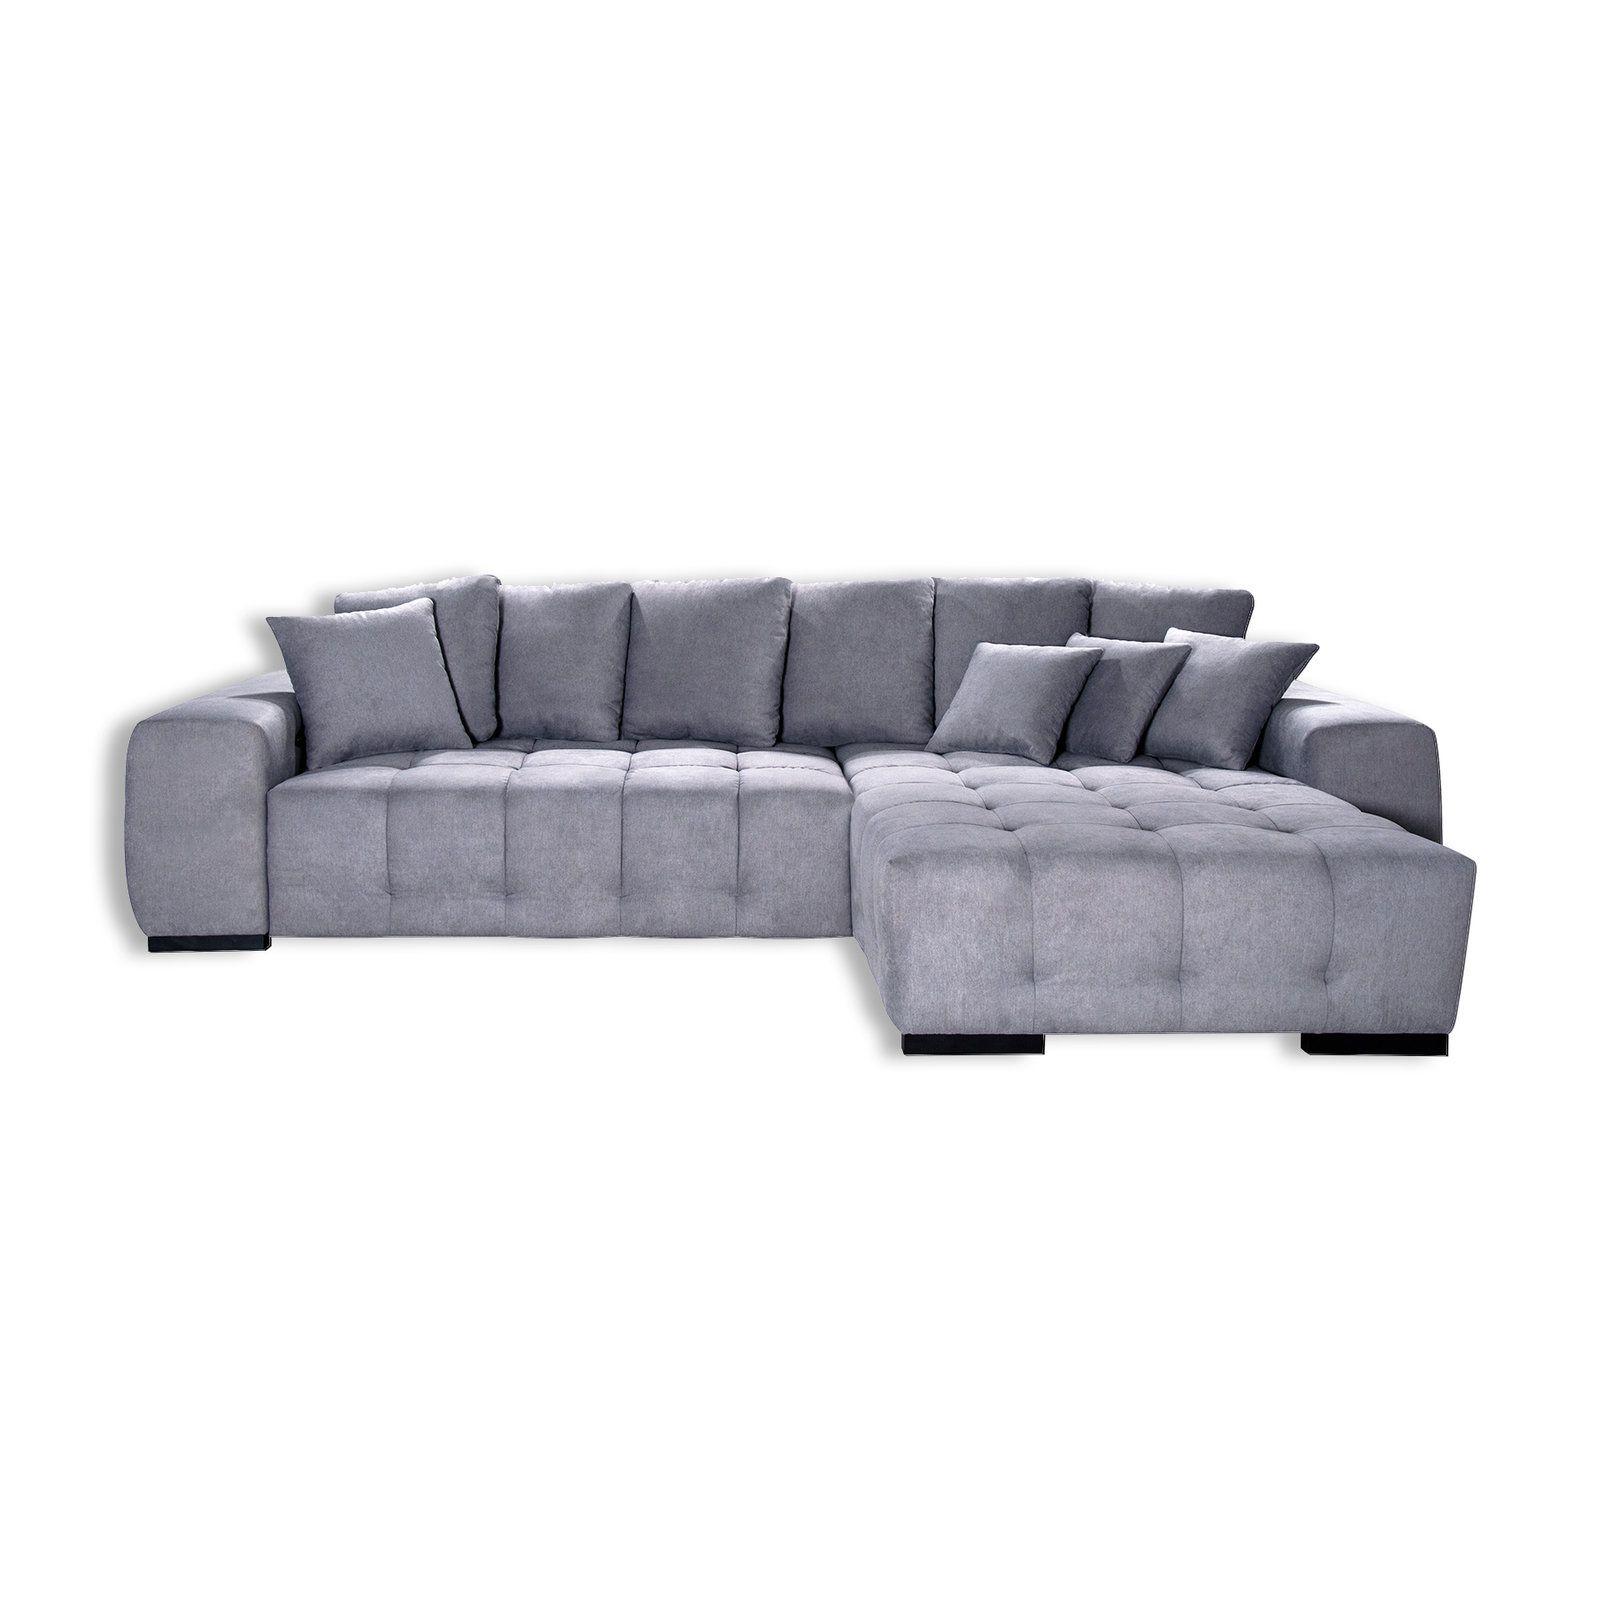 Full Size of Big Sofa Kolonialstil Roller Toronto Couch Sam Grau Rot L Form Spannbezug Chesterfield Halbrundes Home Affaire Landhaus Alternatives Husse Hocker Recamiere Wohnzimmer Big Sofa Roller